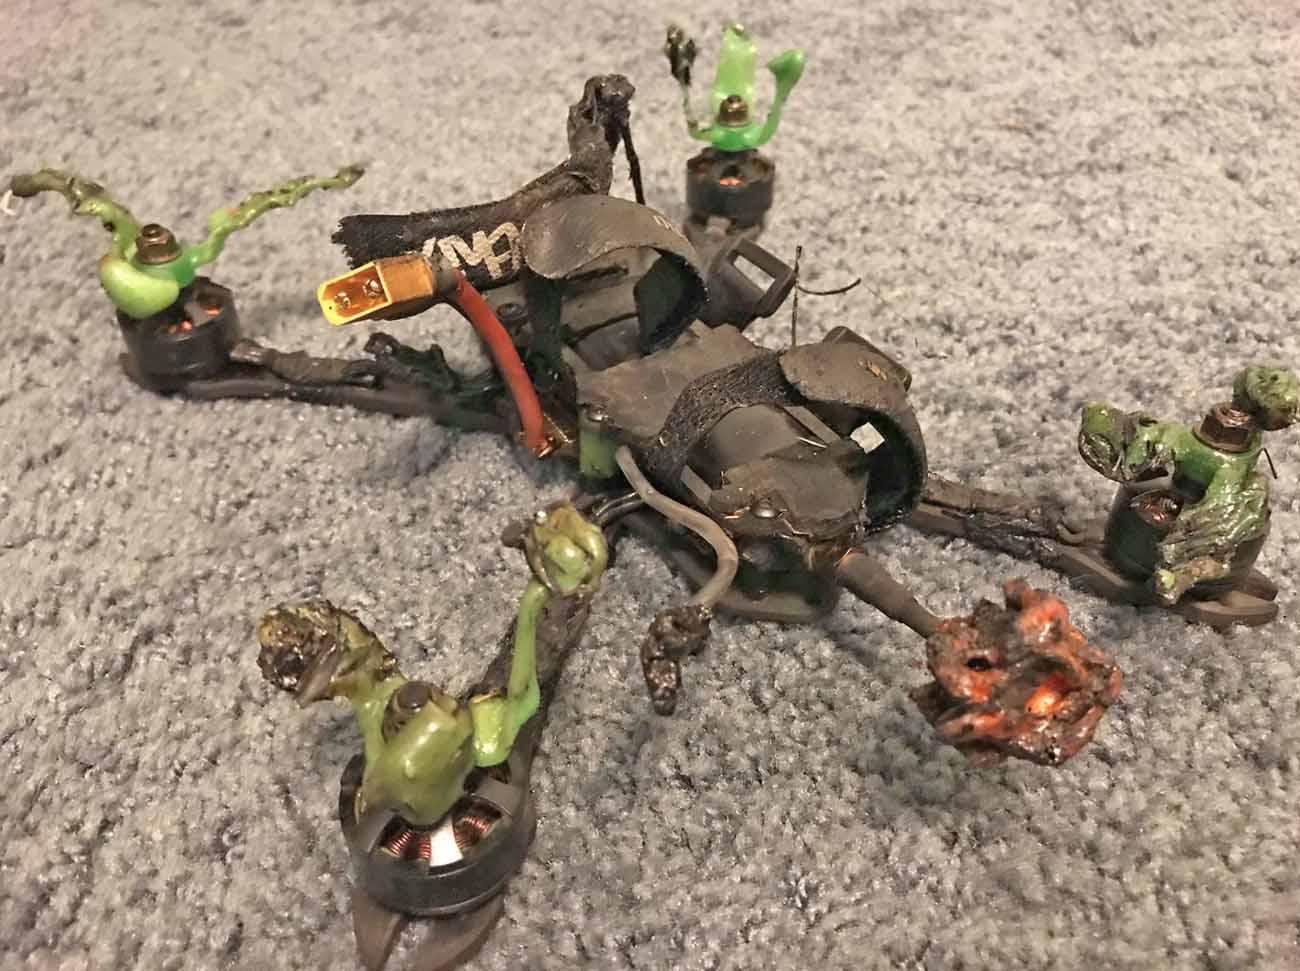 drone crash starts fire